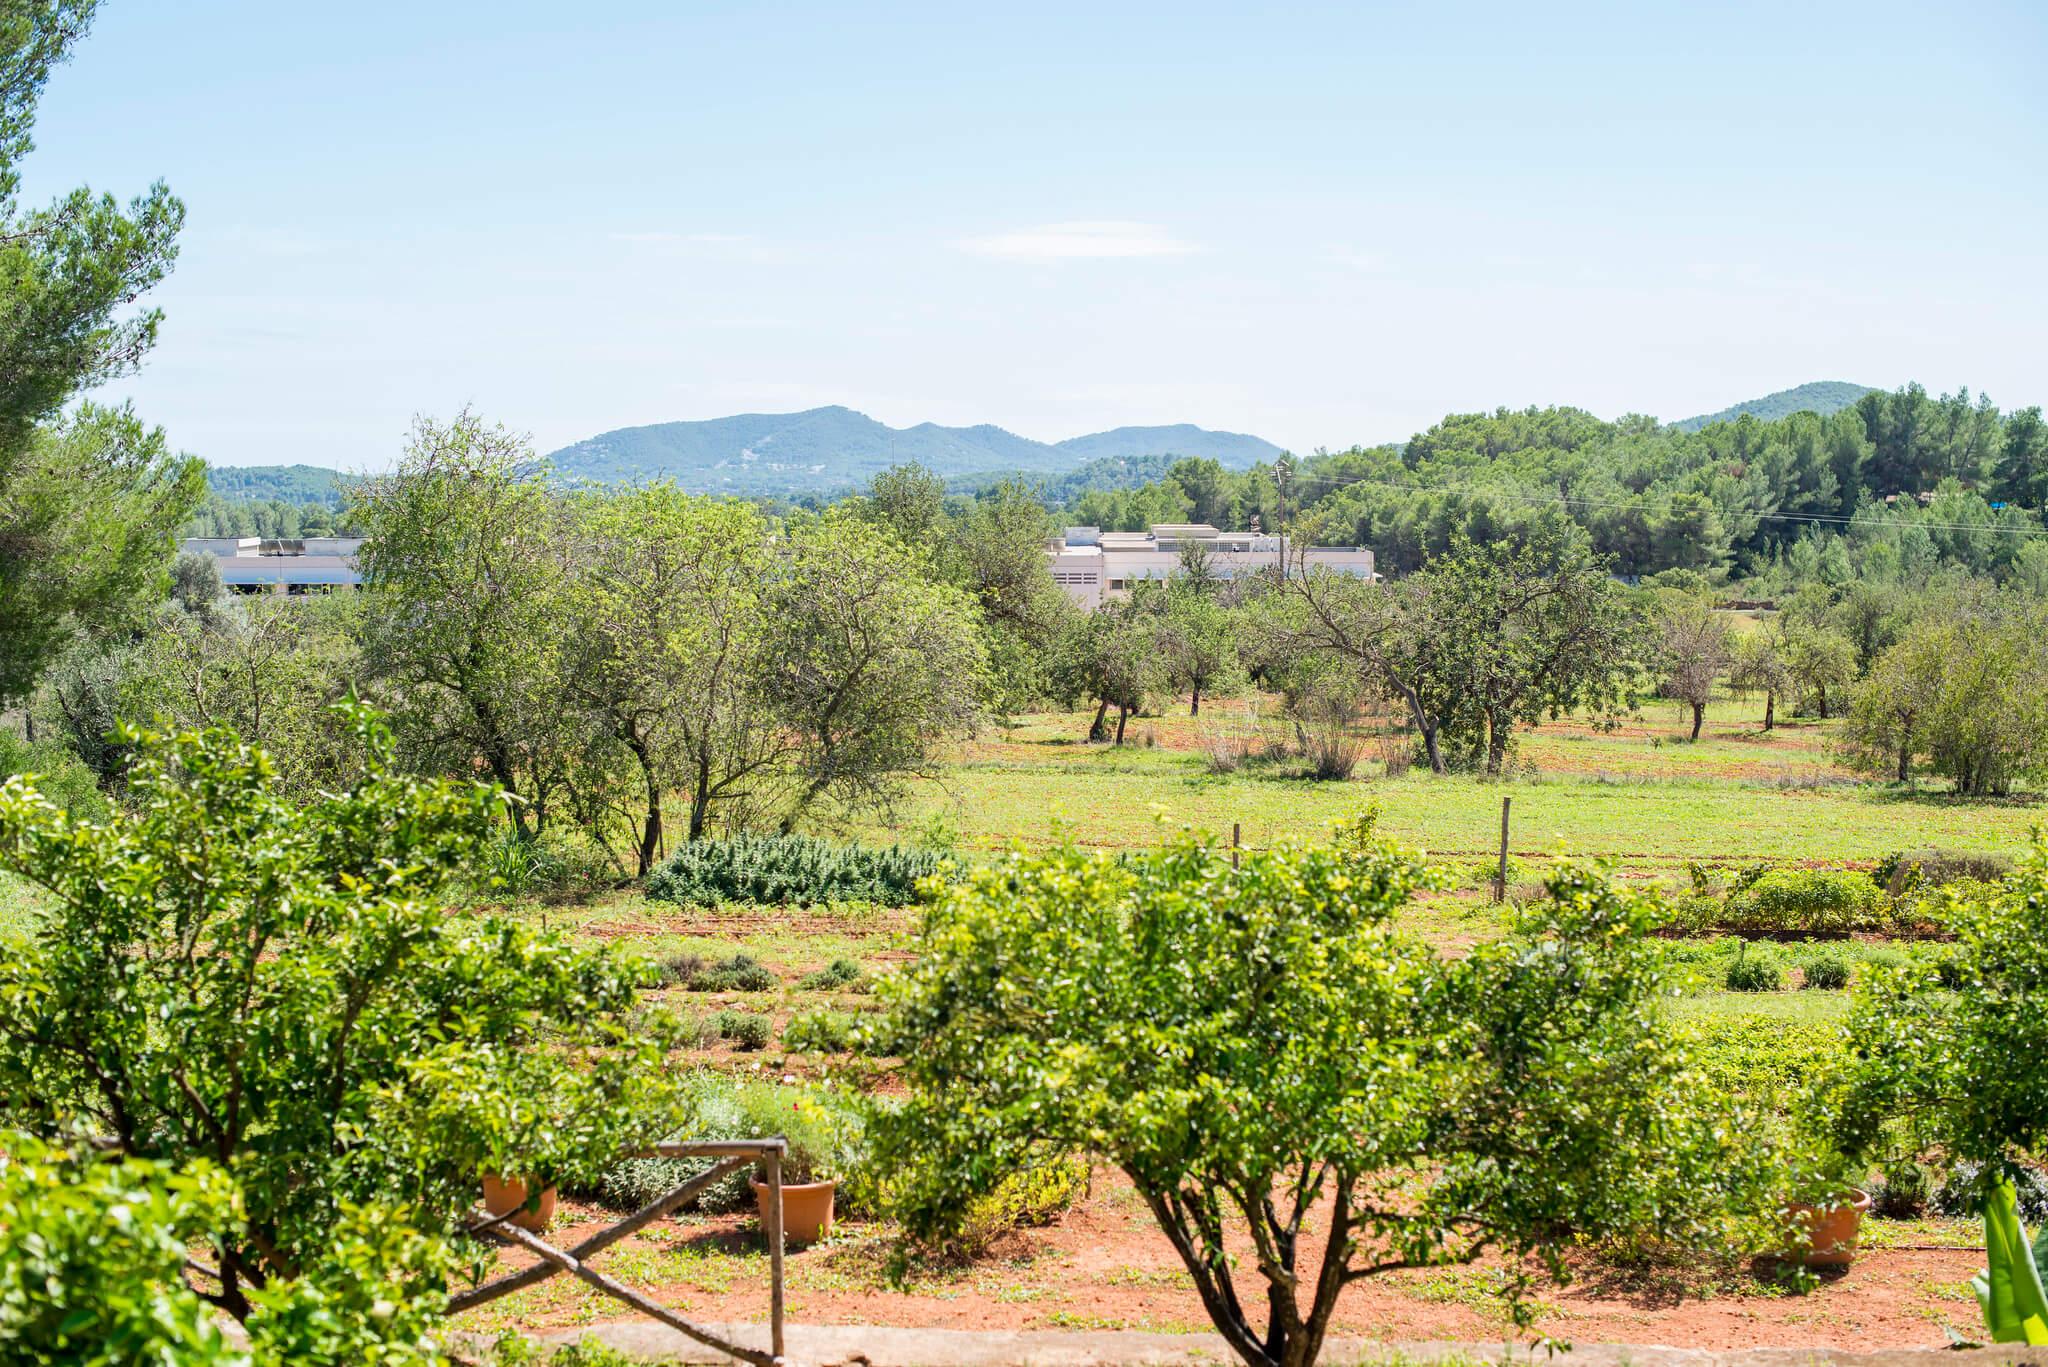 https://www.white-ibiza.com/wp-content/uploads/2020/05/white-ibiza-villas-where-to-stay-san-lorenzo-06.jpg